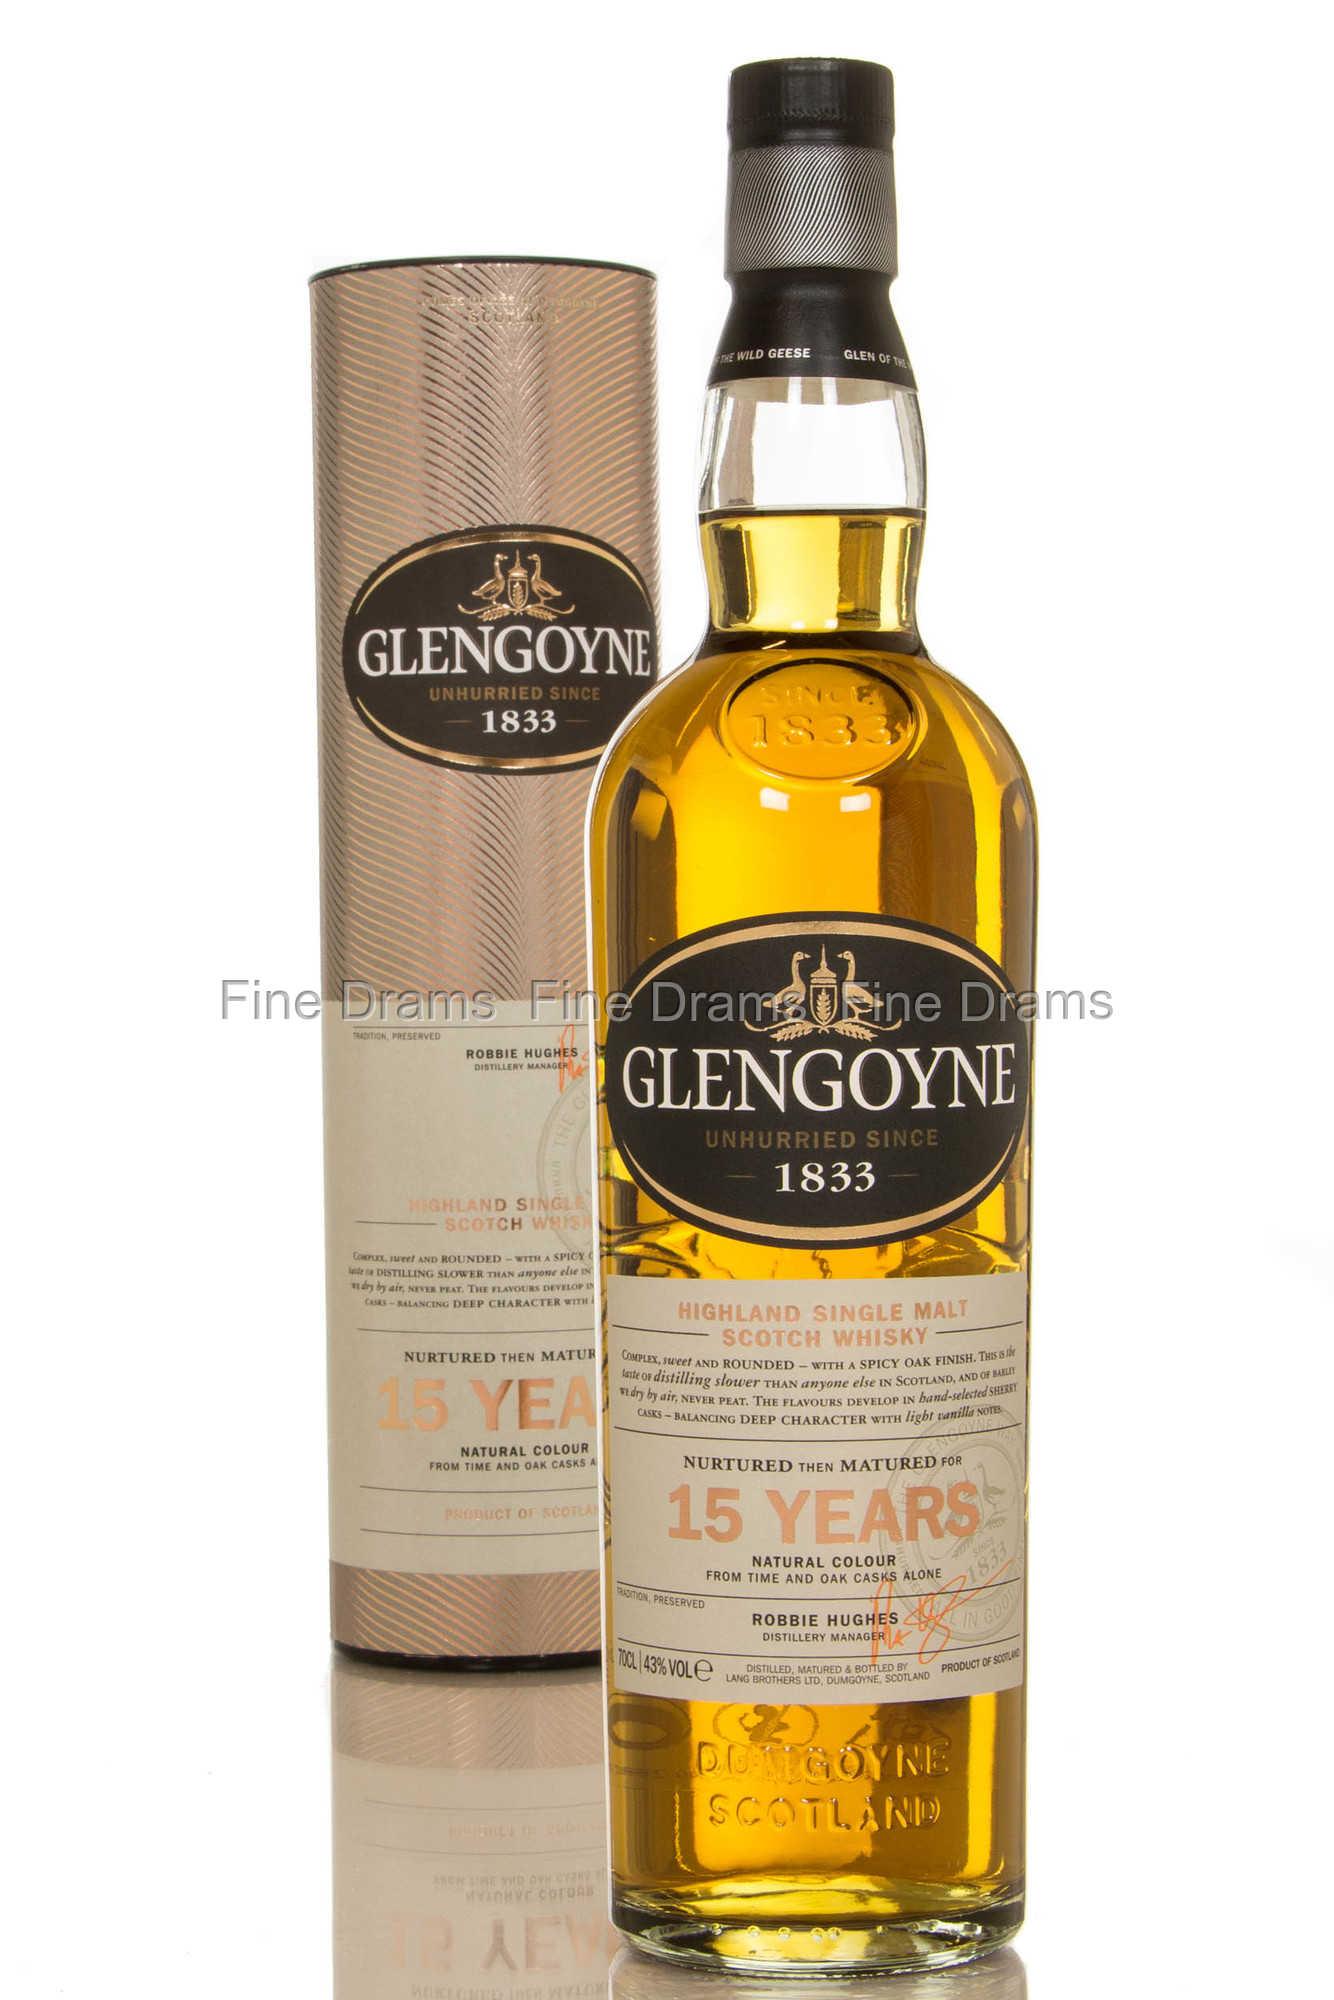 Glengoyne 15 Year Old Scotch Single Malt Whisky